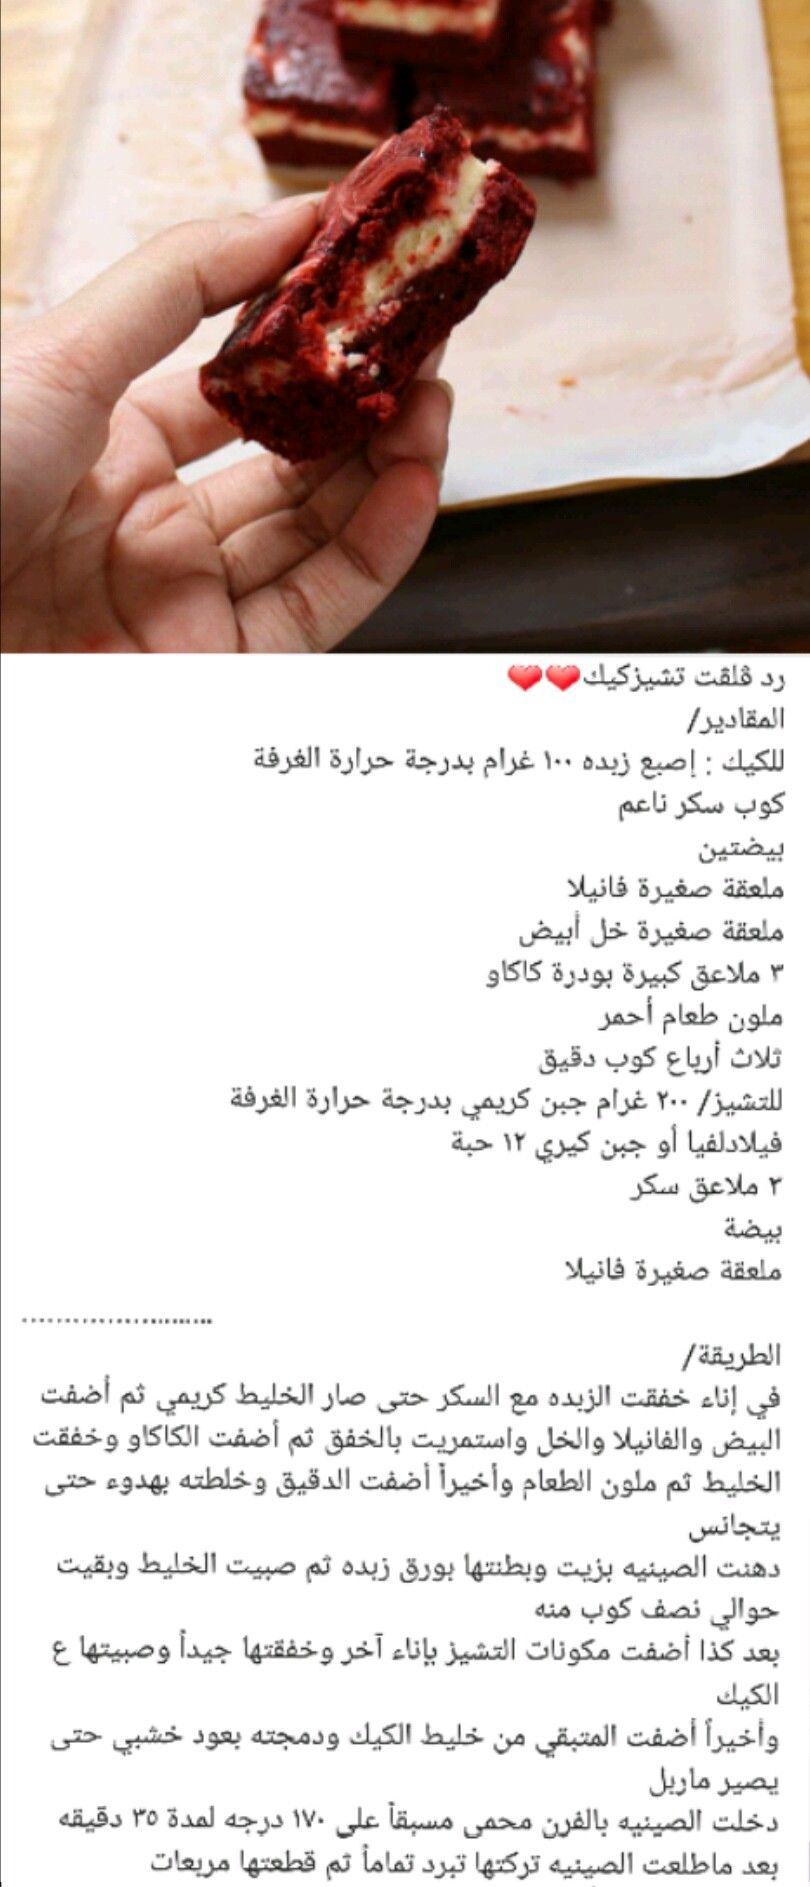 Pin By Asma Alotaibi On طبخ Desserts Food Bacon